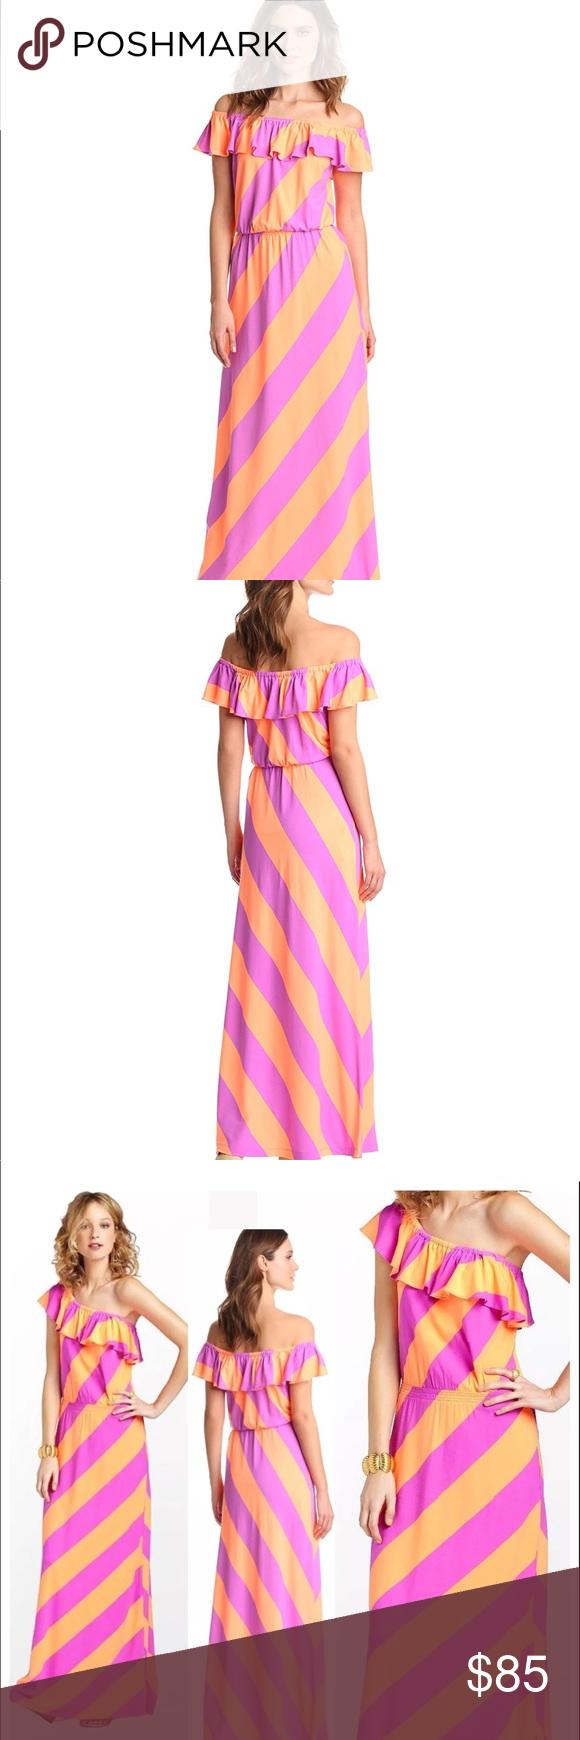 Lilly Pulitzer Marley Maxi dress large NWT